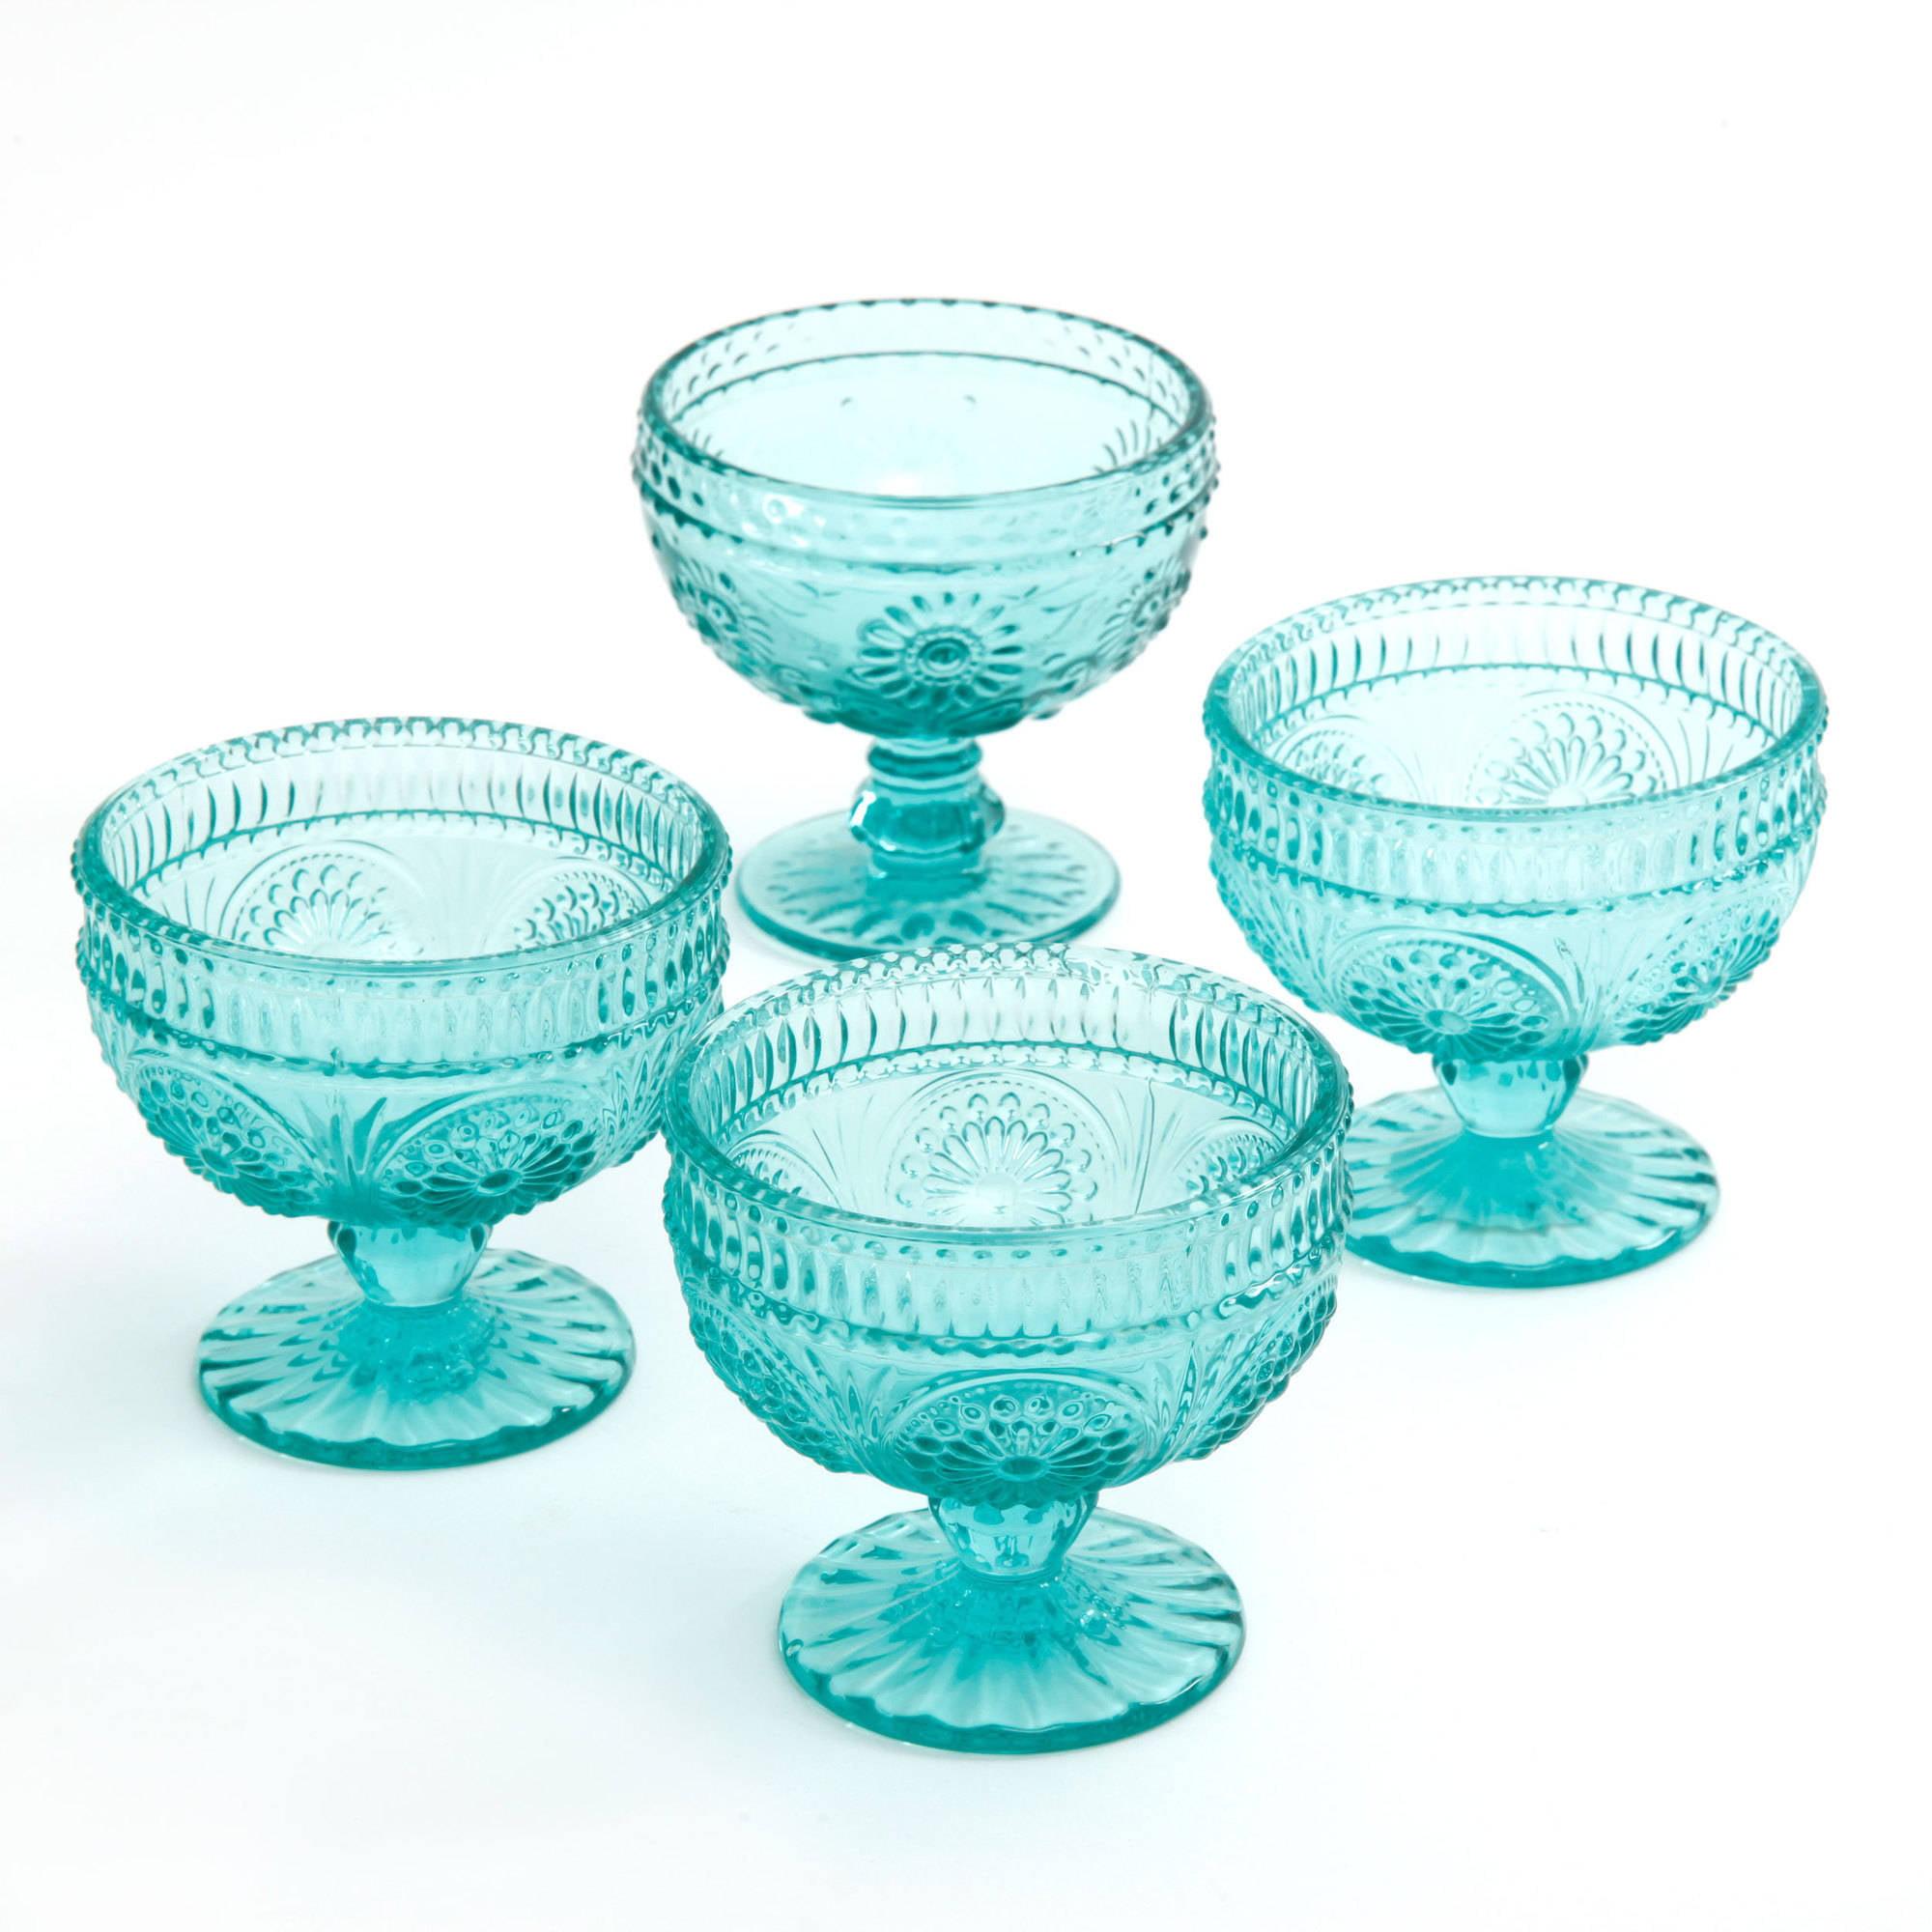 The Pioneer Woman Adeline 10 Oz Gl Sundae Cups Set Of 4